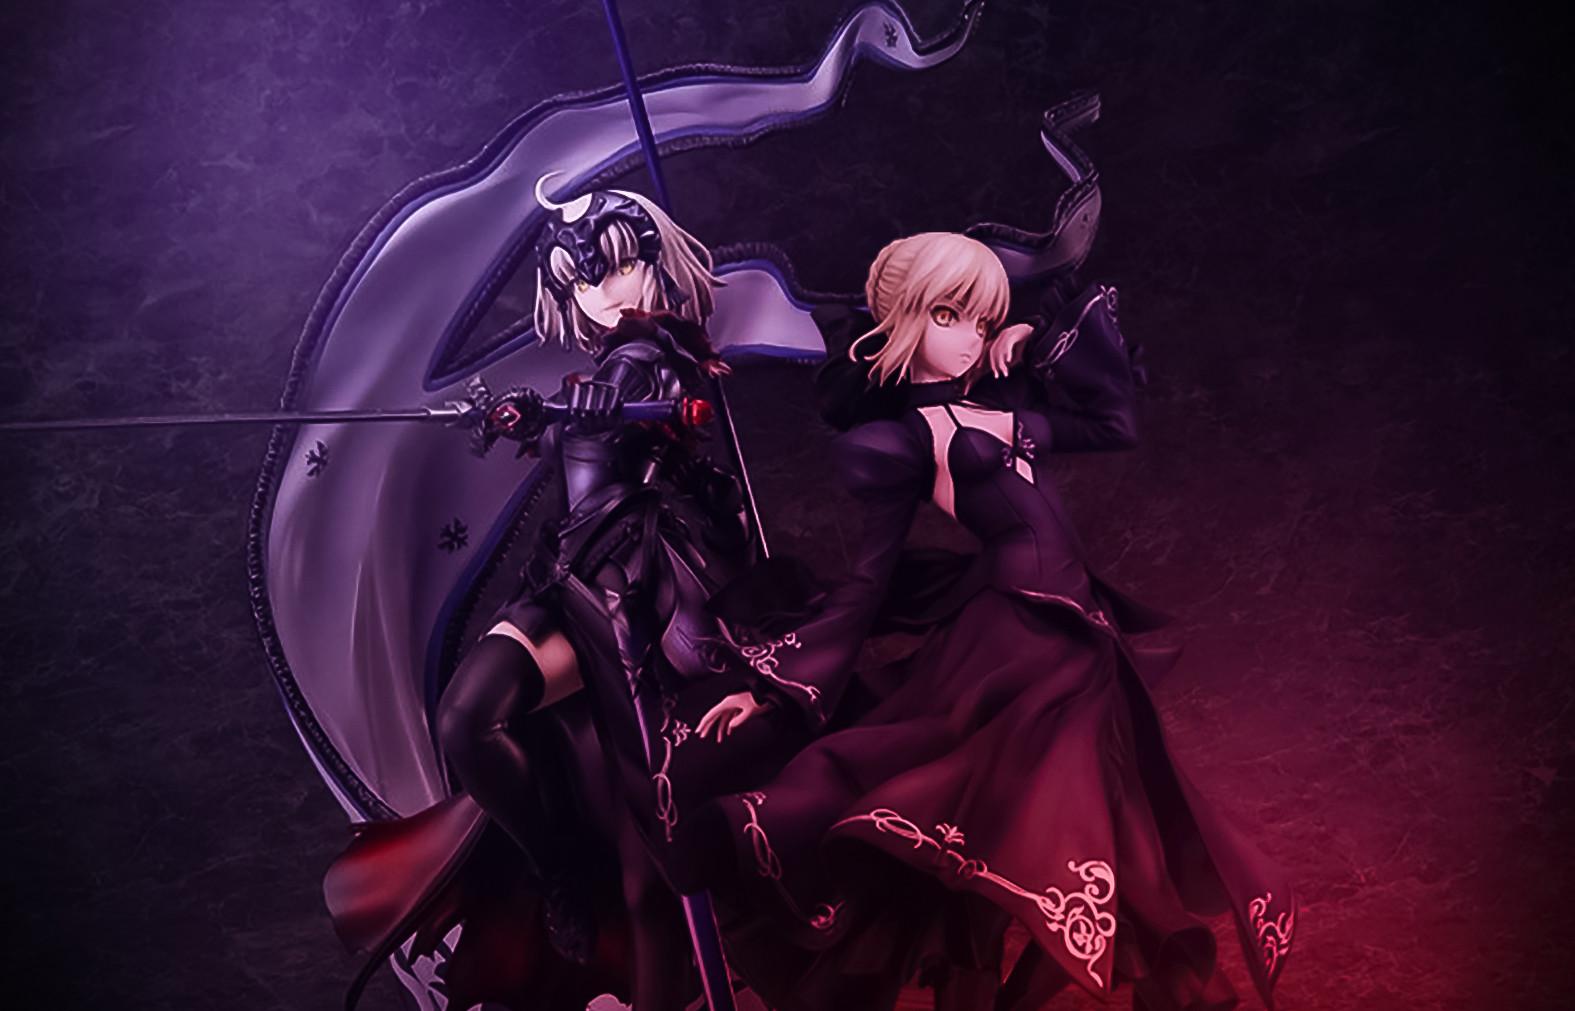 alter type_moon saber_alter m.i.c. aniplex nobuta urakawa_akinori fate/grand_order tetsumori_nanami jeanne_d'arc_(alter)